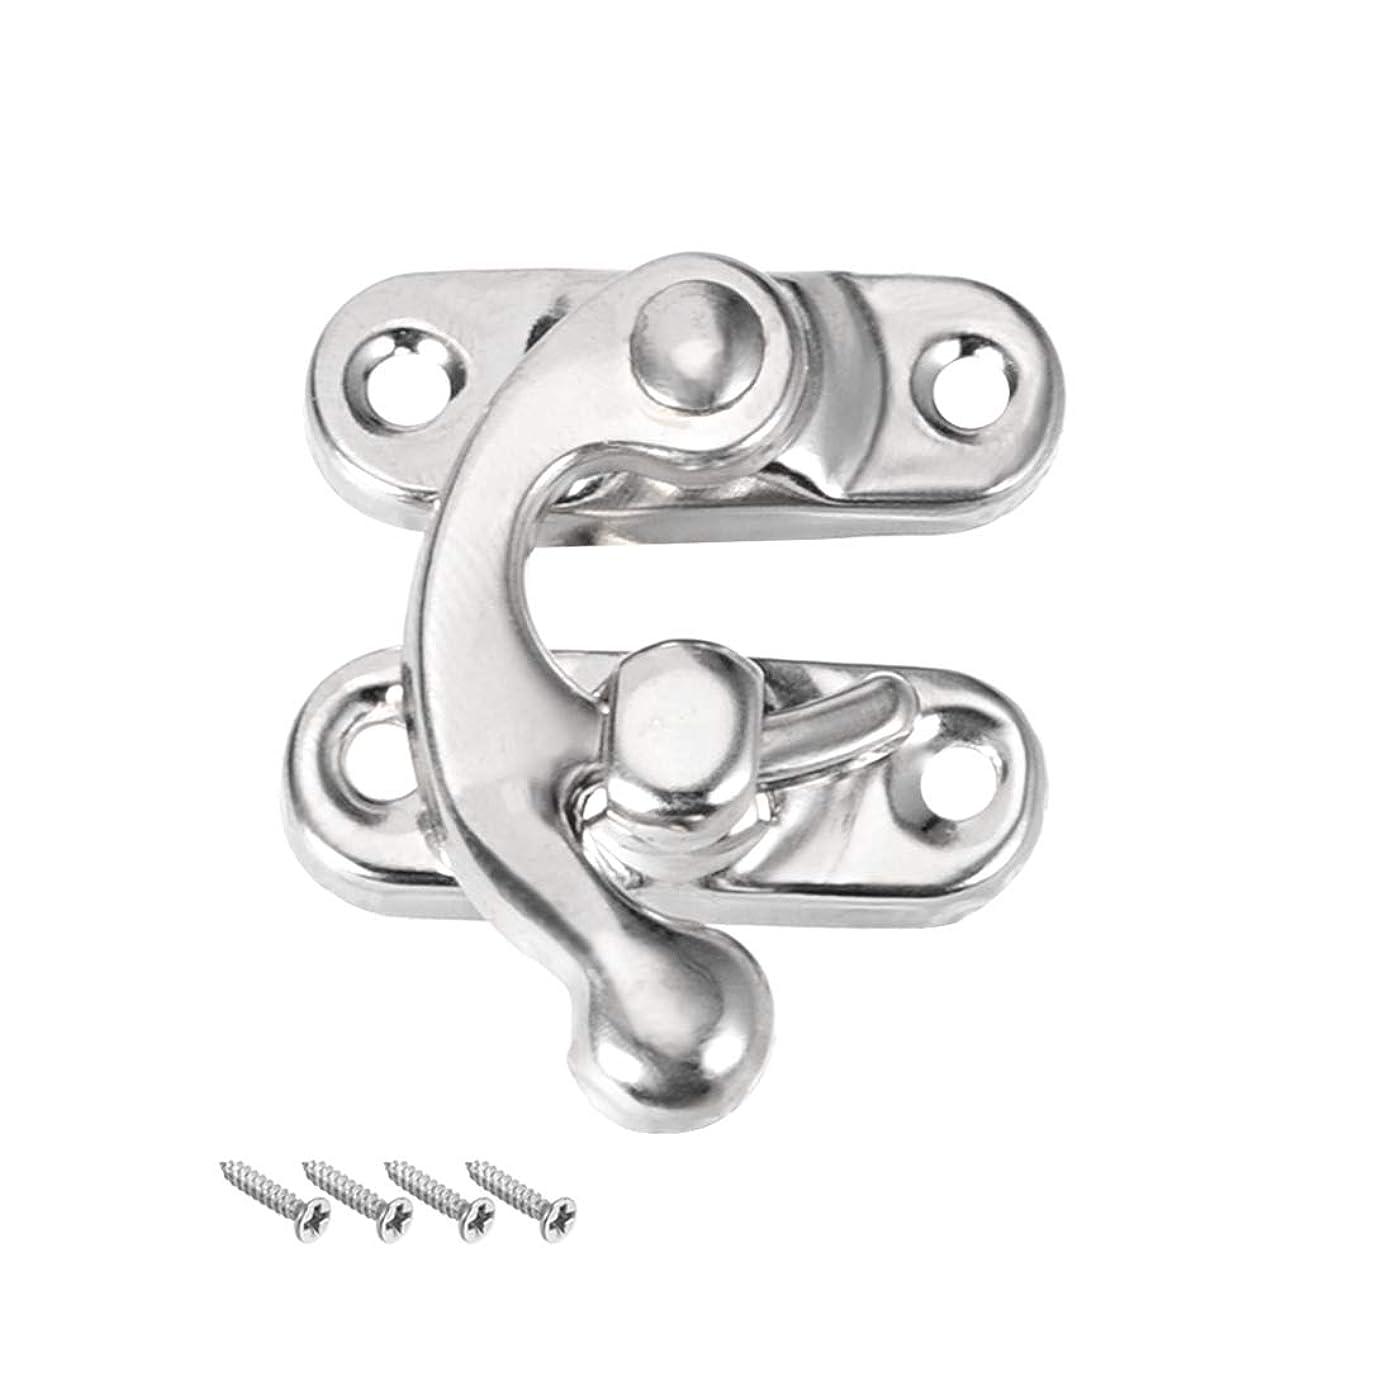 uxcell Antique Left Latch Hook Hasp, Swing Arm Latch Silver Tone 5 Pcs w Screws